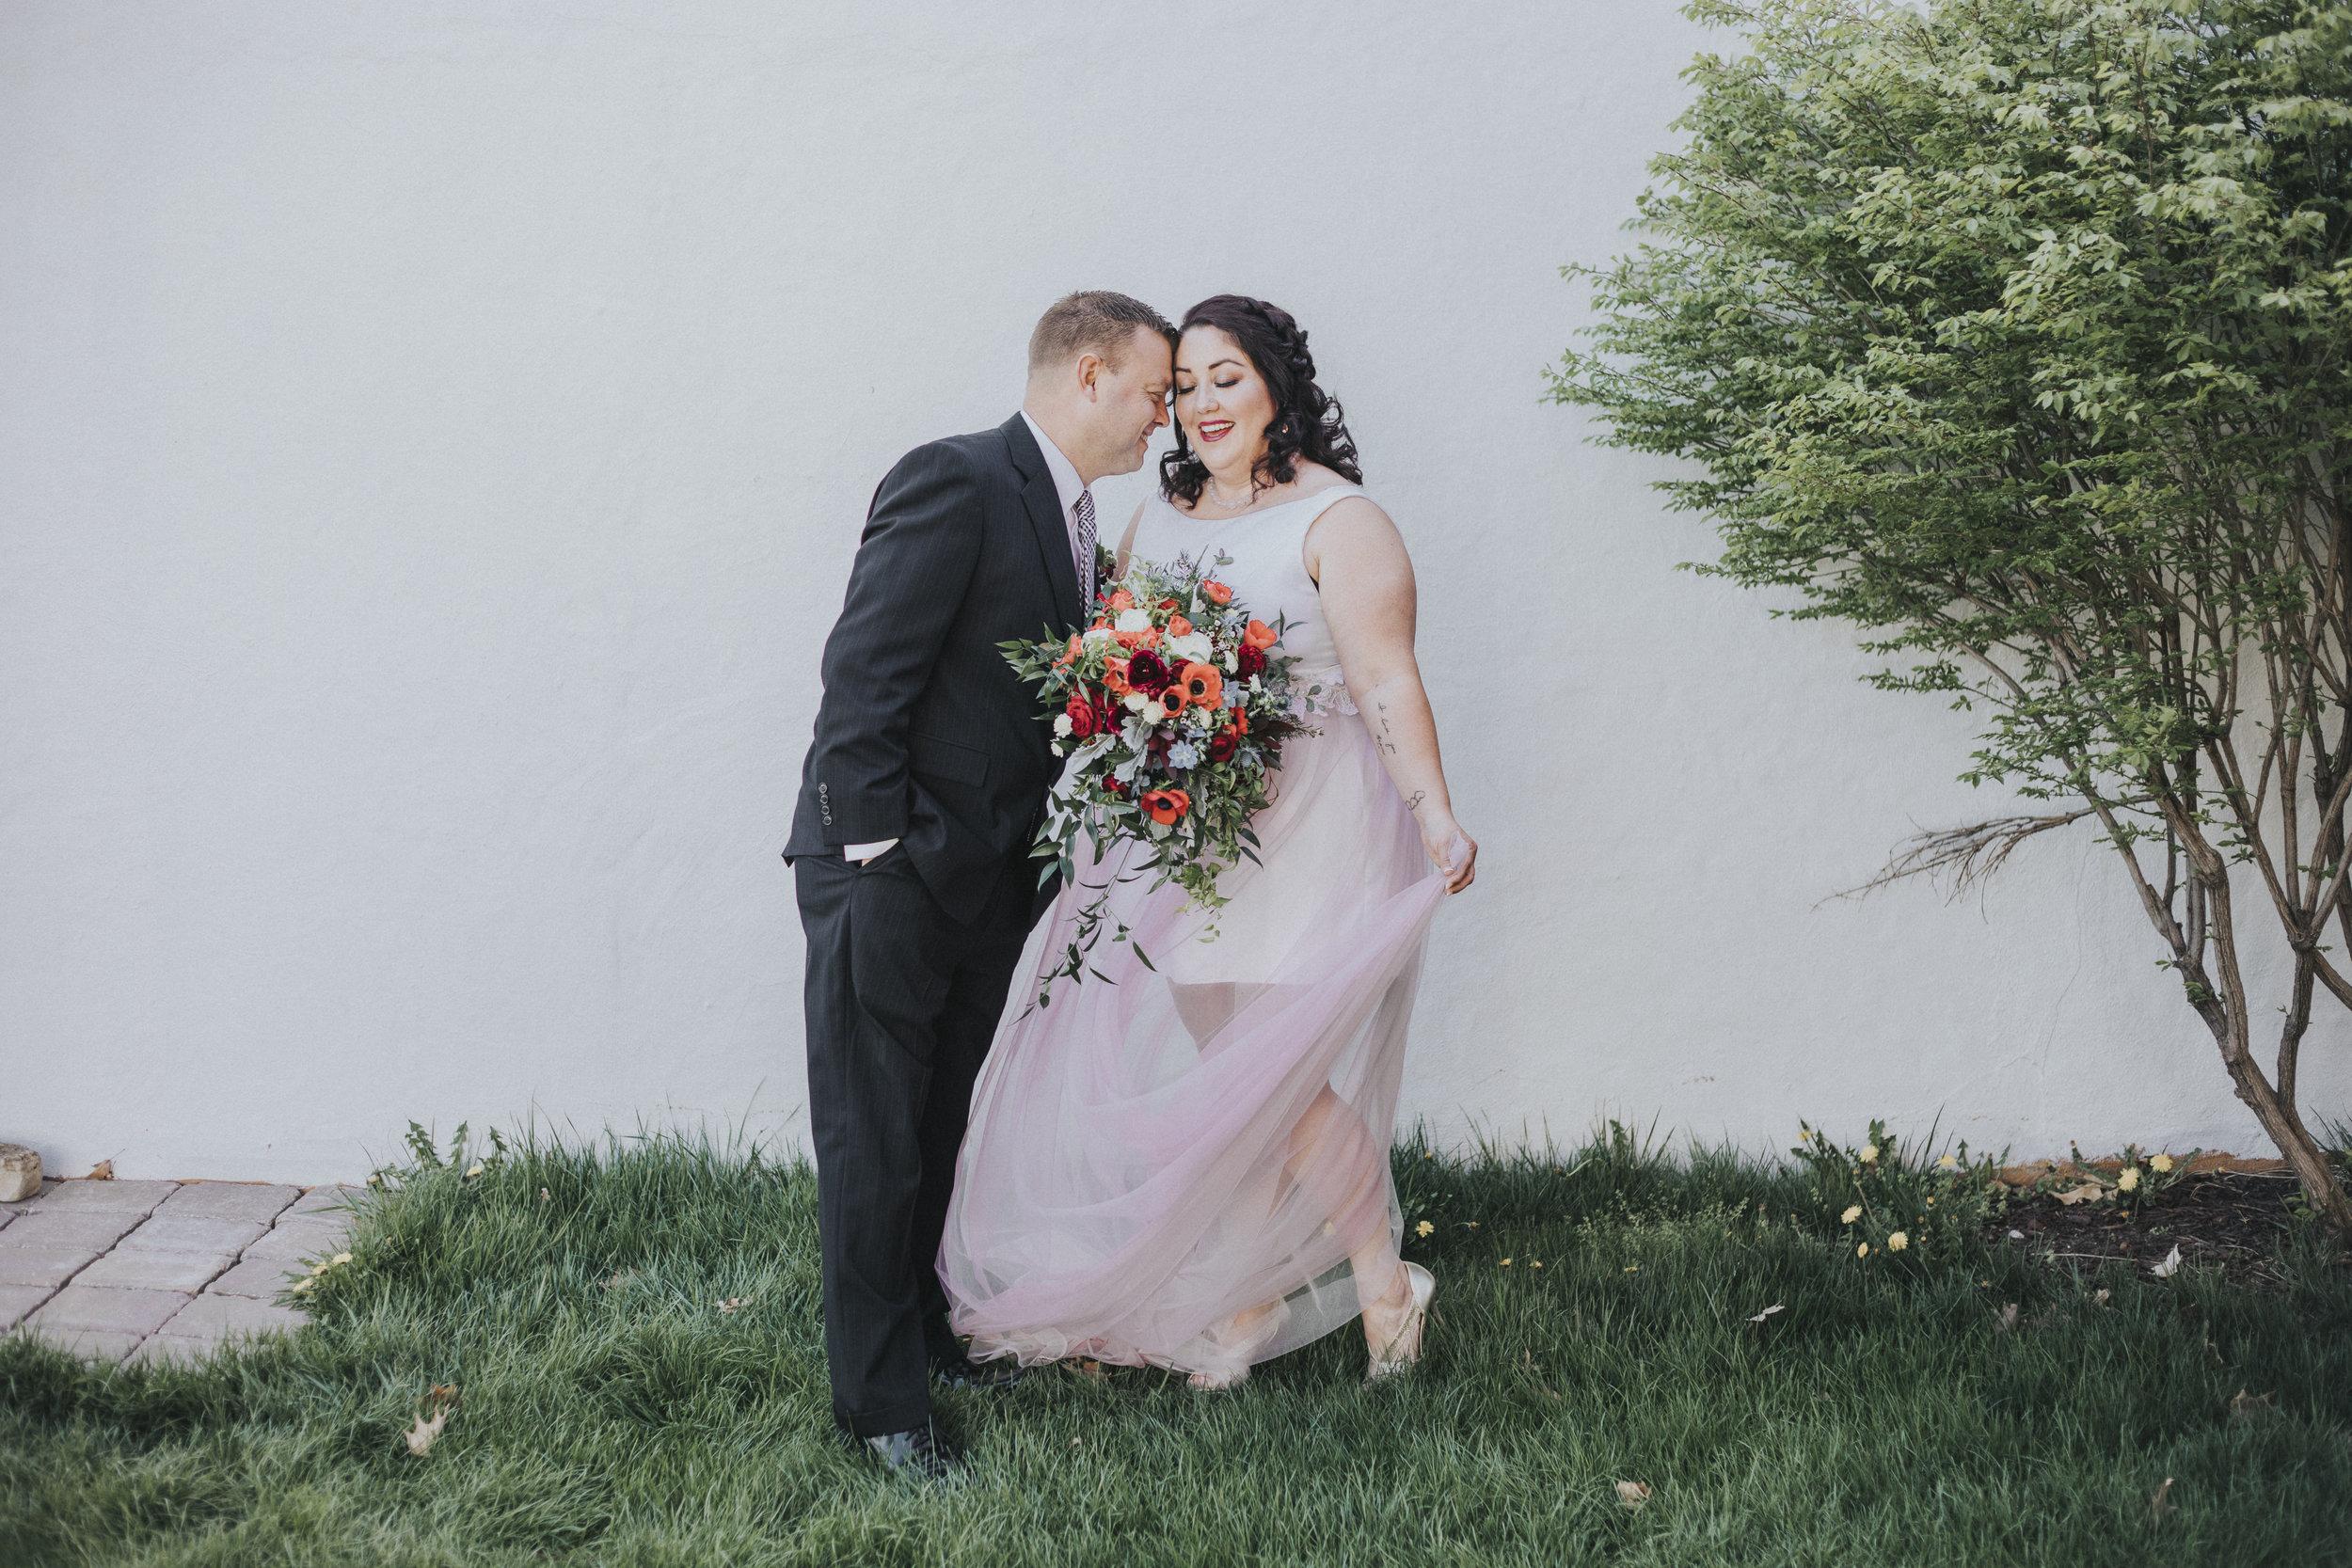 49 midwest-colorado-nebraska-elopement-photography-gretna-turtledoves.jpg